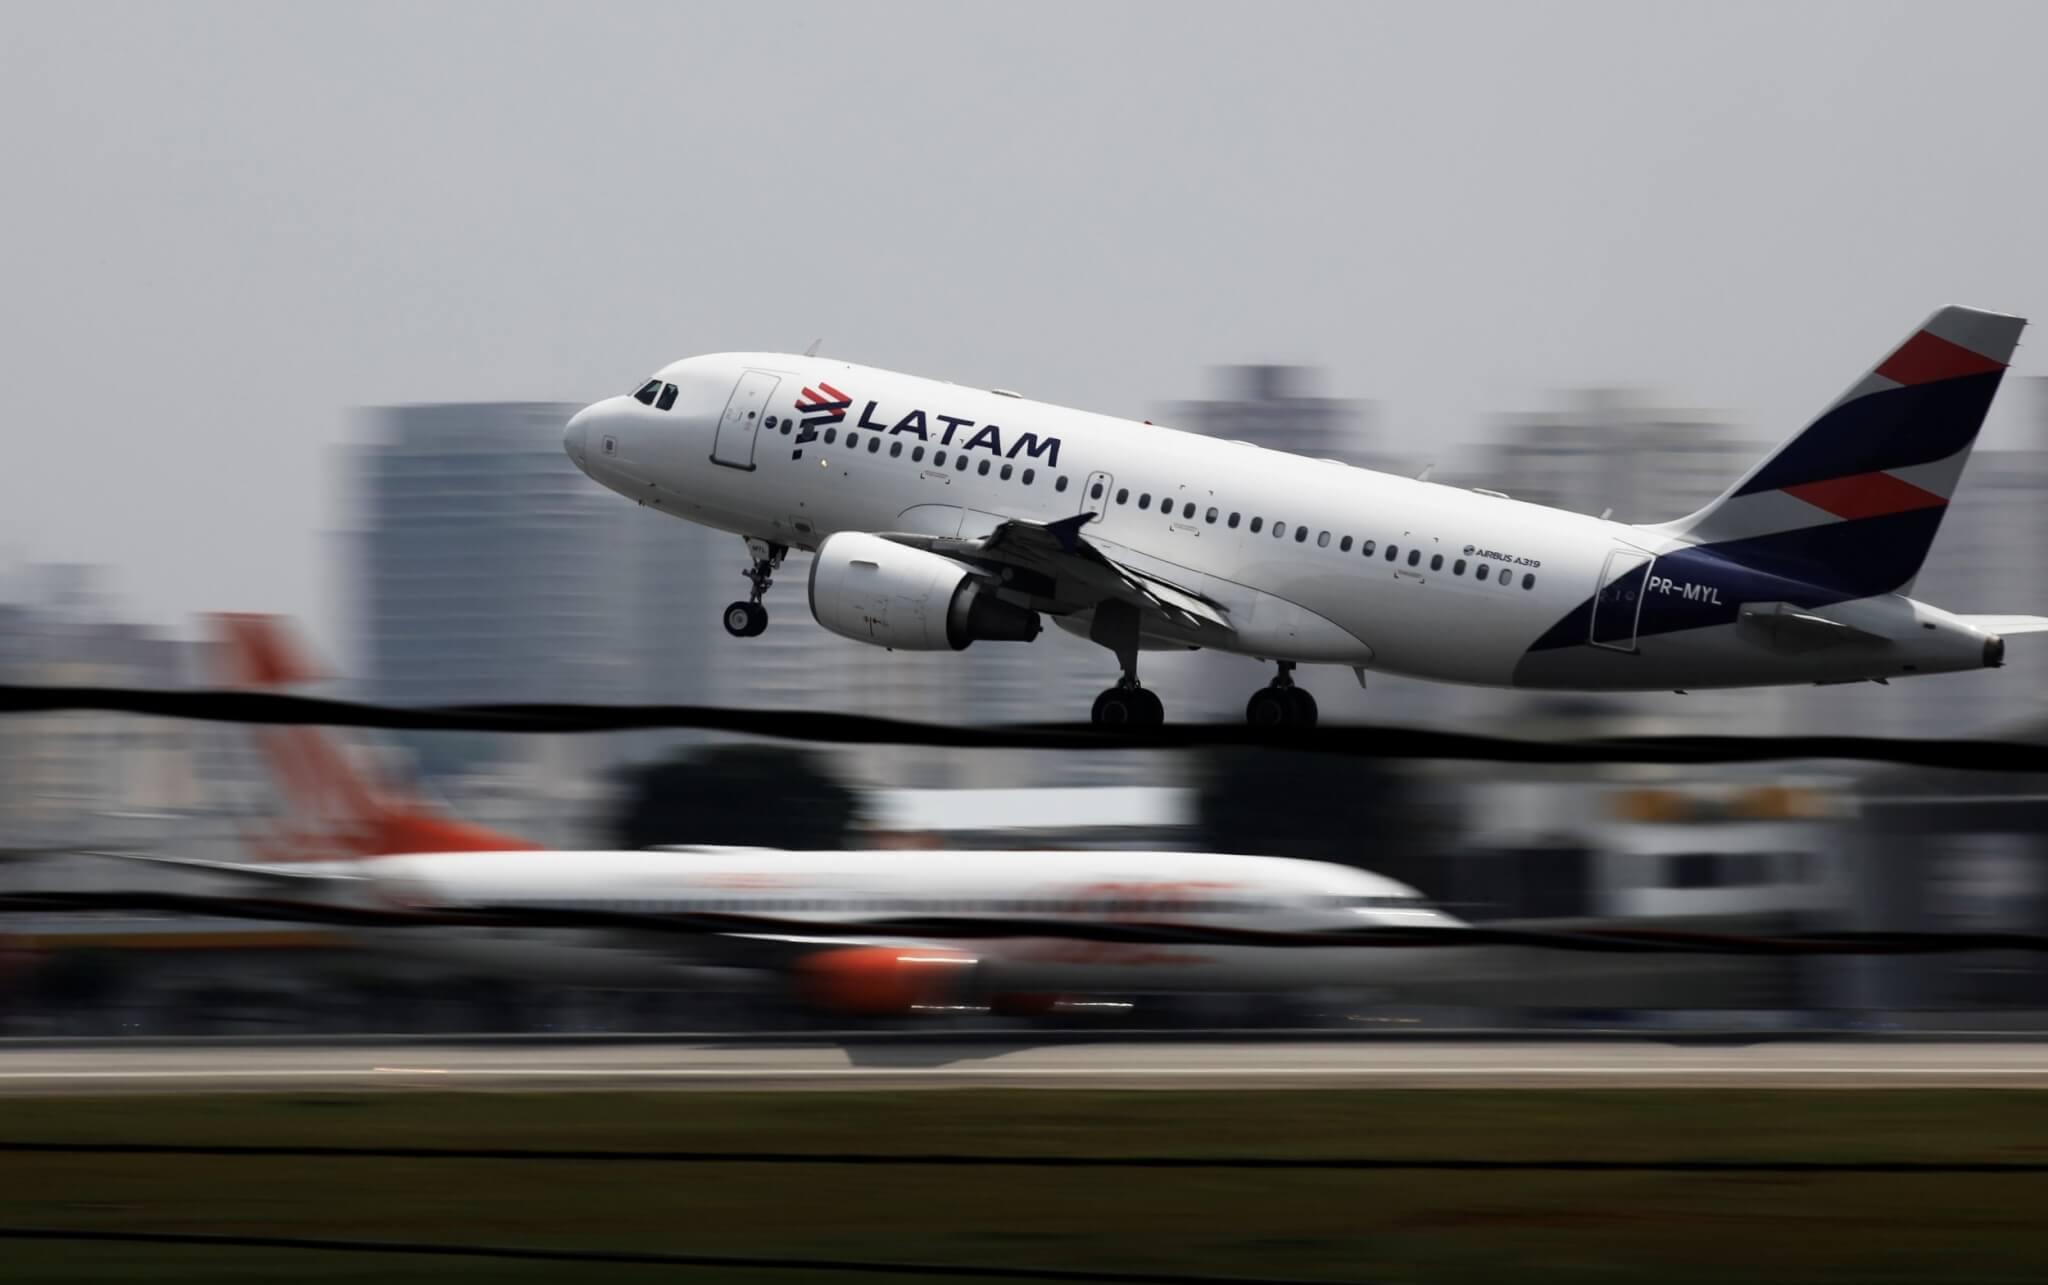 LATAM moves its New York JFK operations